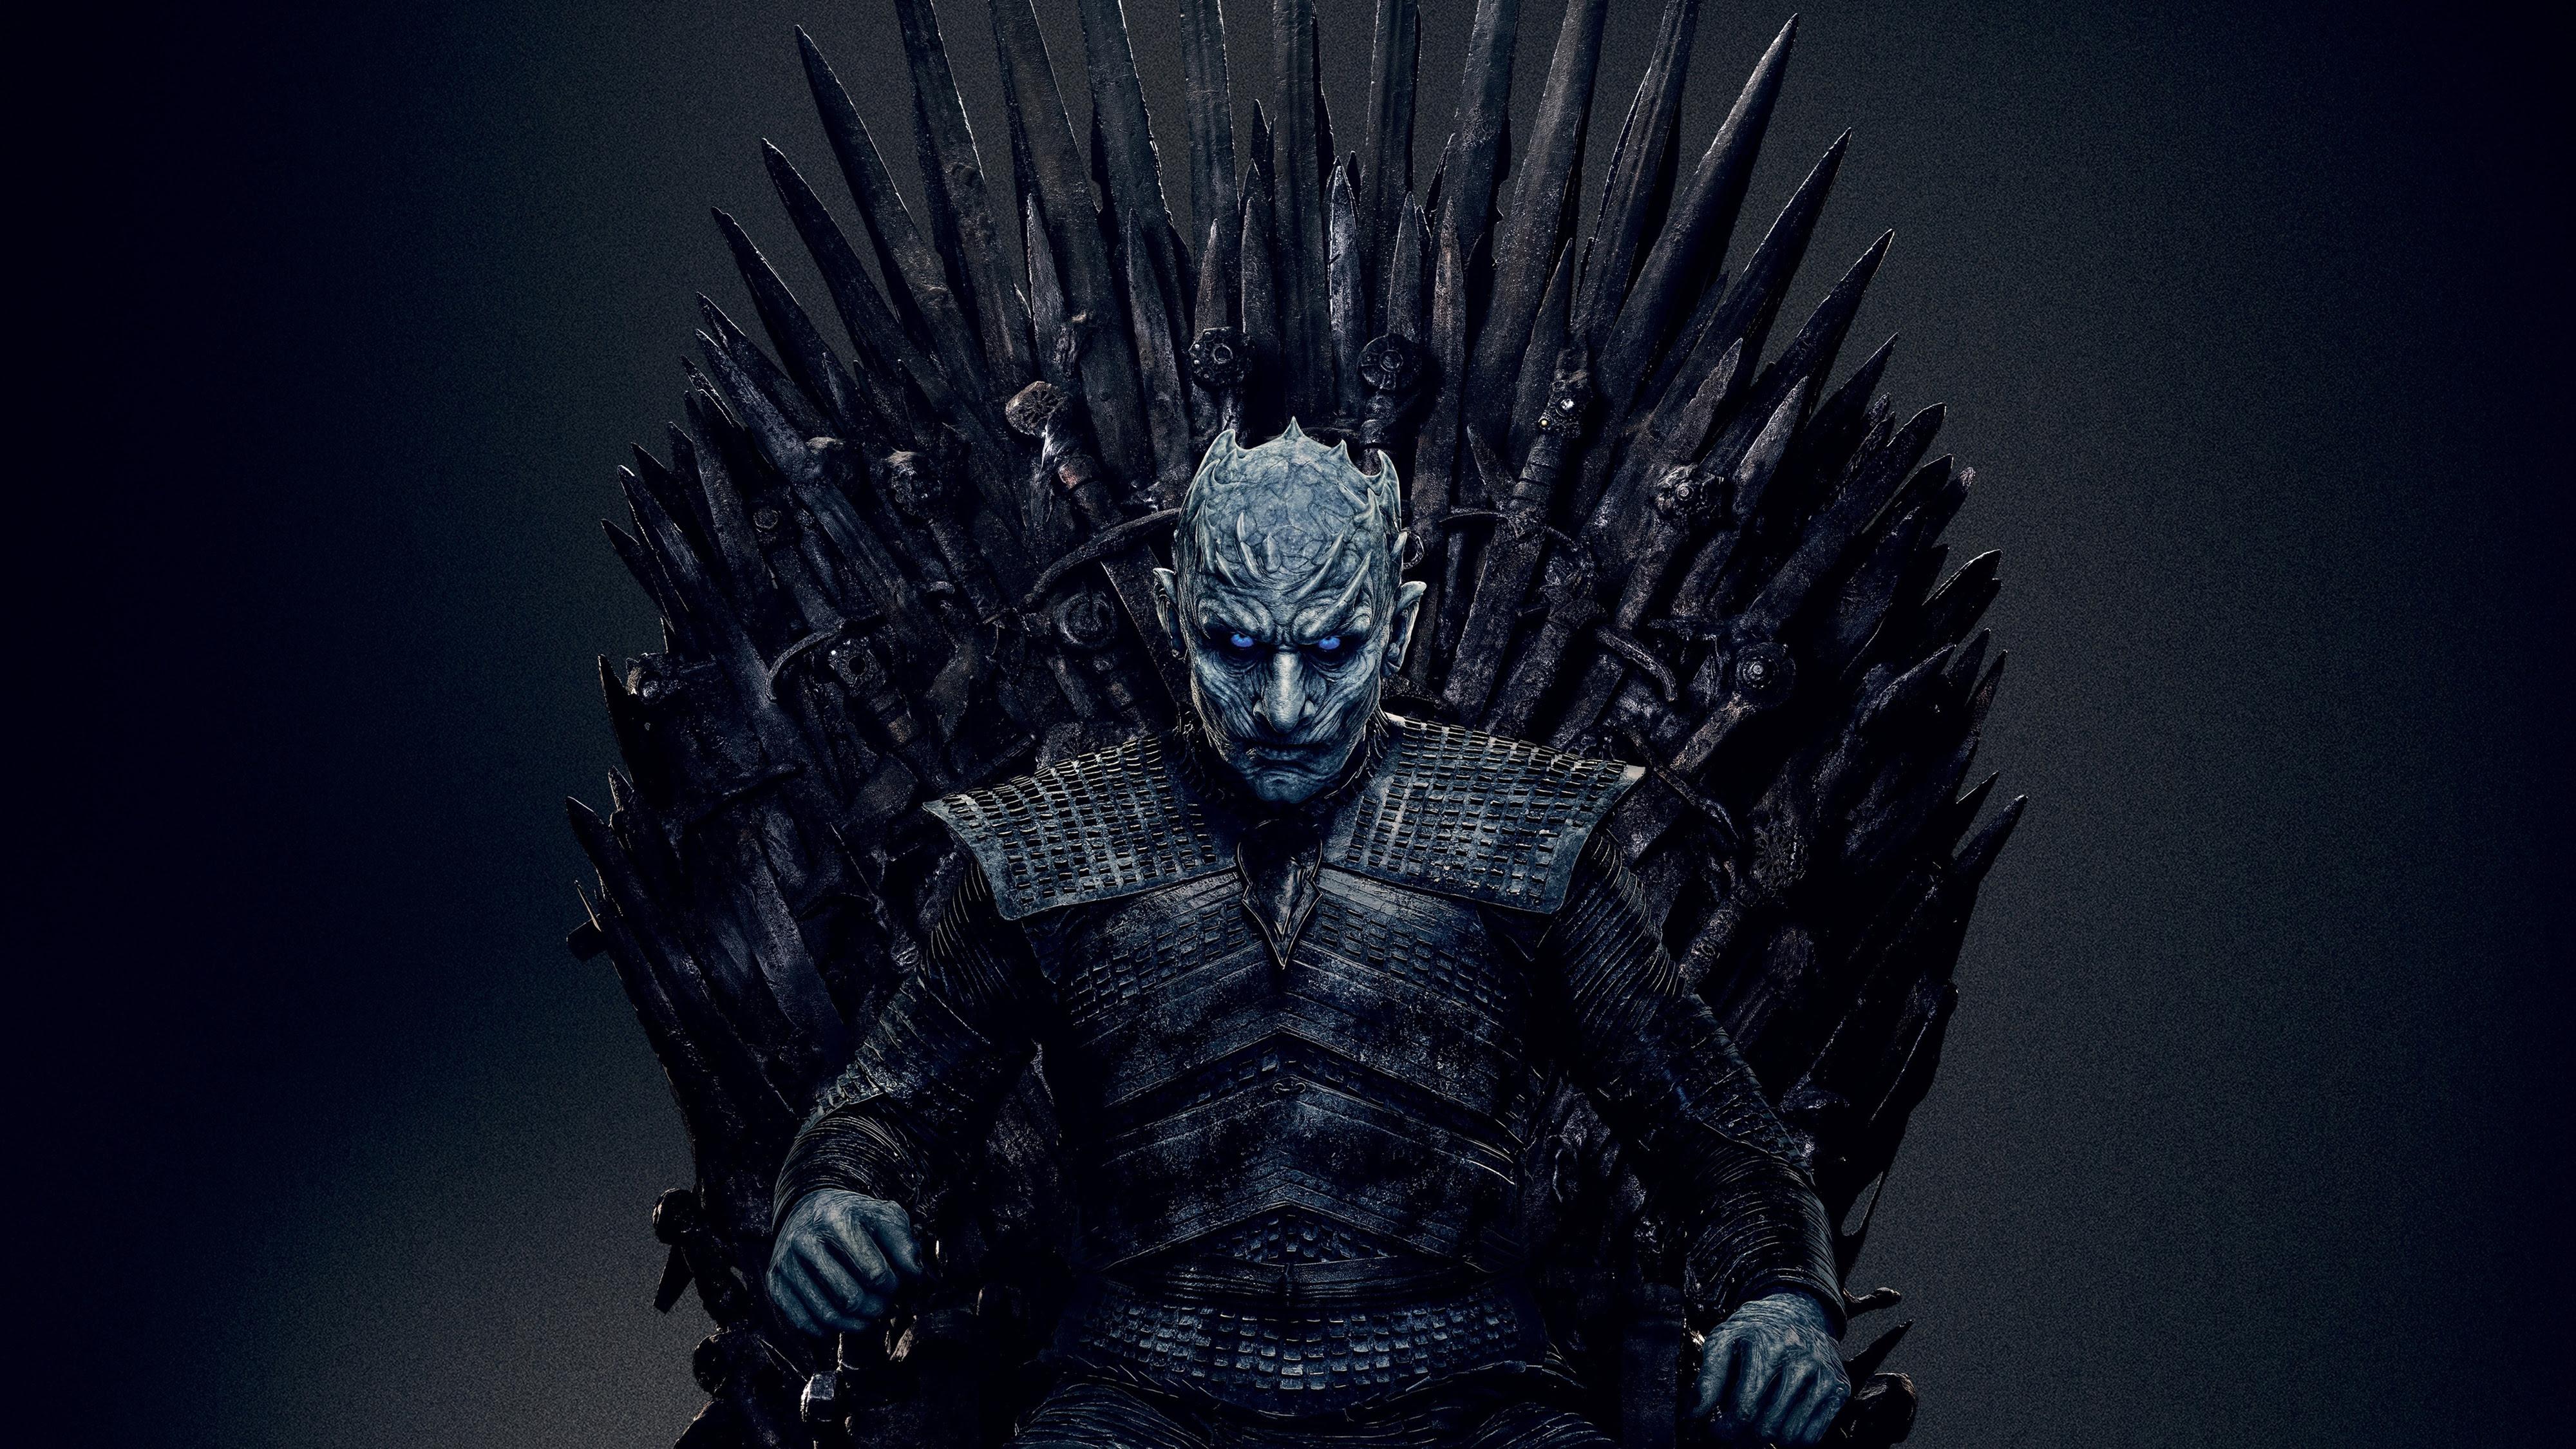 Night King In Game Of Thrones Season 8 4k Wallpapers Hd Wallpapers